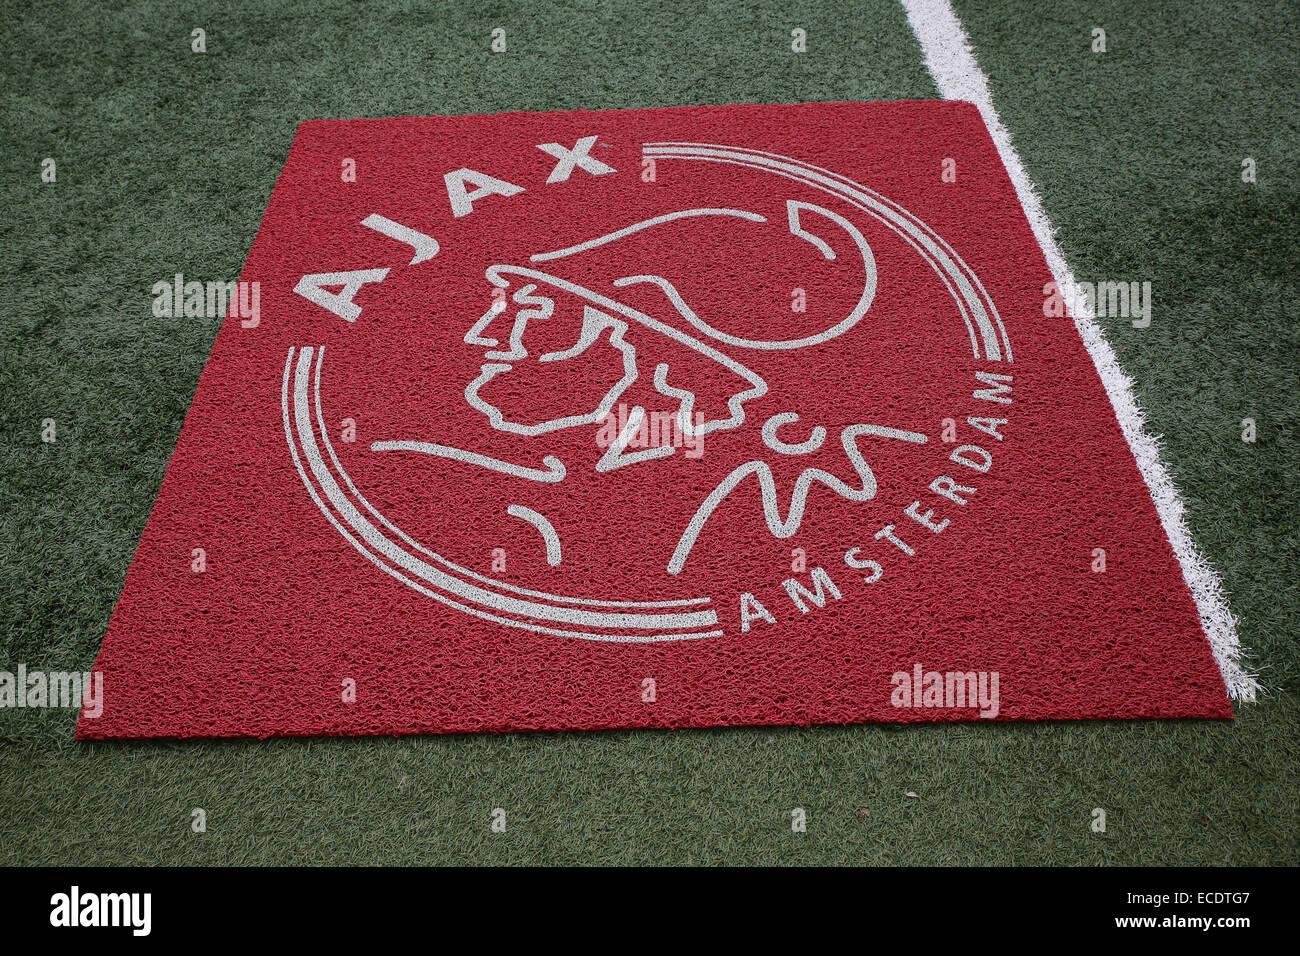 Amsterdam Ajax logo - Stock Image